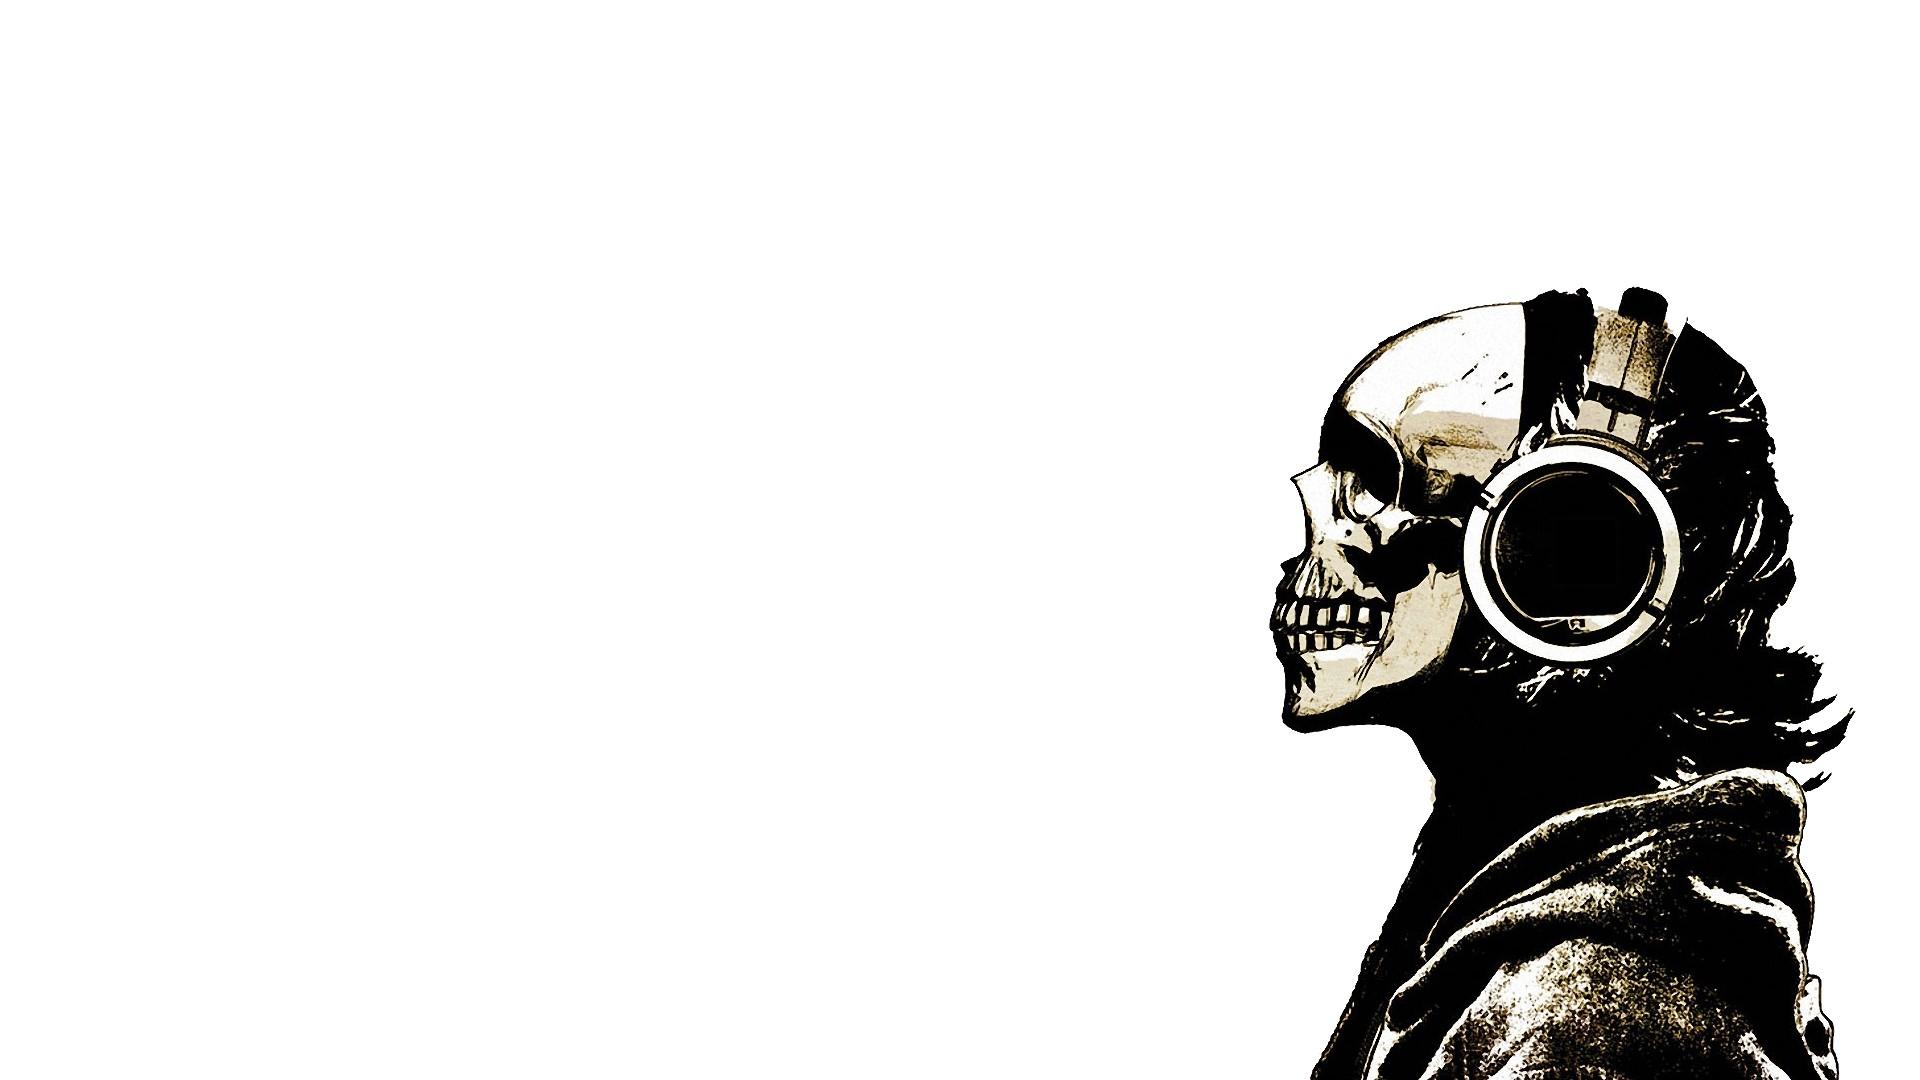 Skull with Headphones I like this | Soundbass | Pinterest | Wallpaper, Hd  wallpaper and Music wallpaper